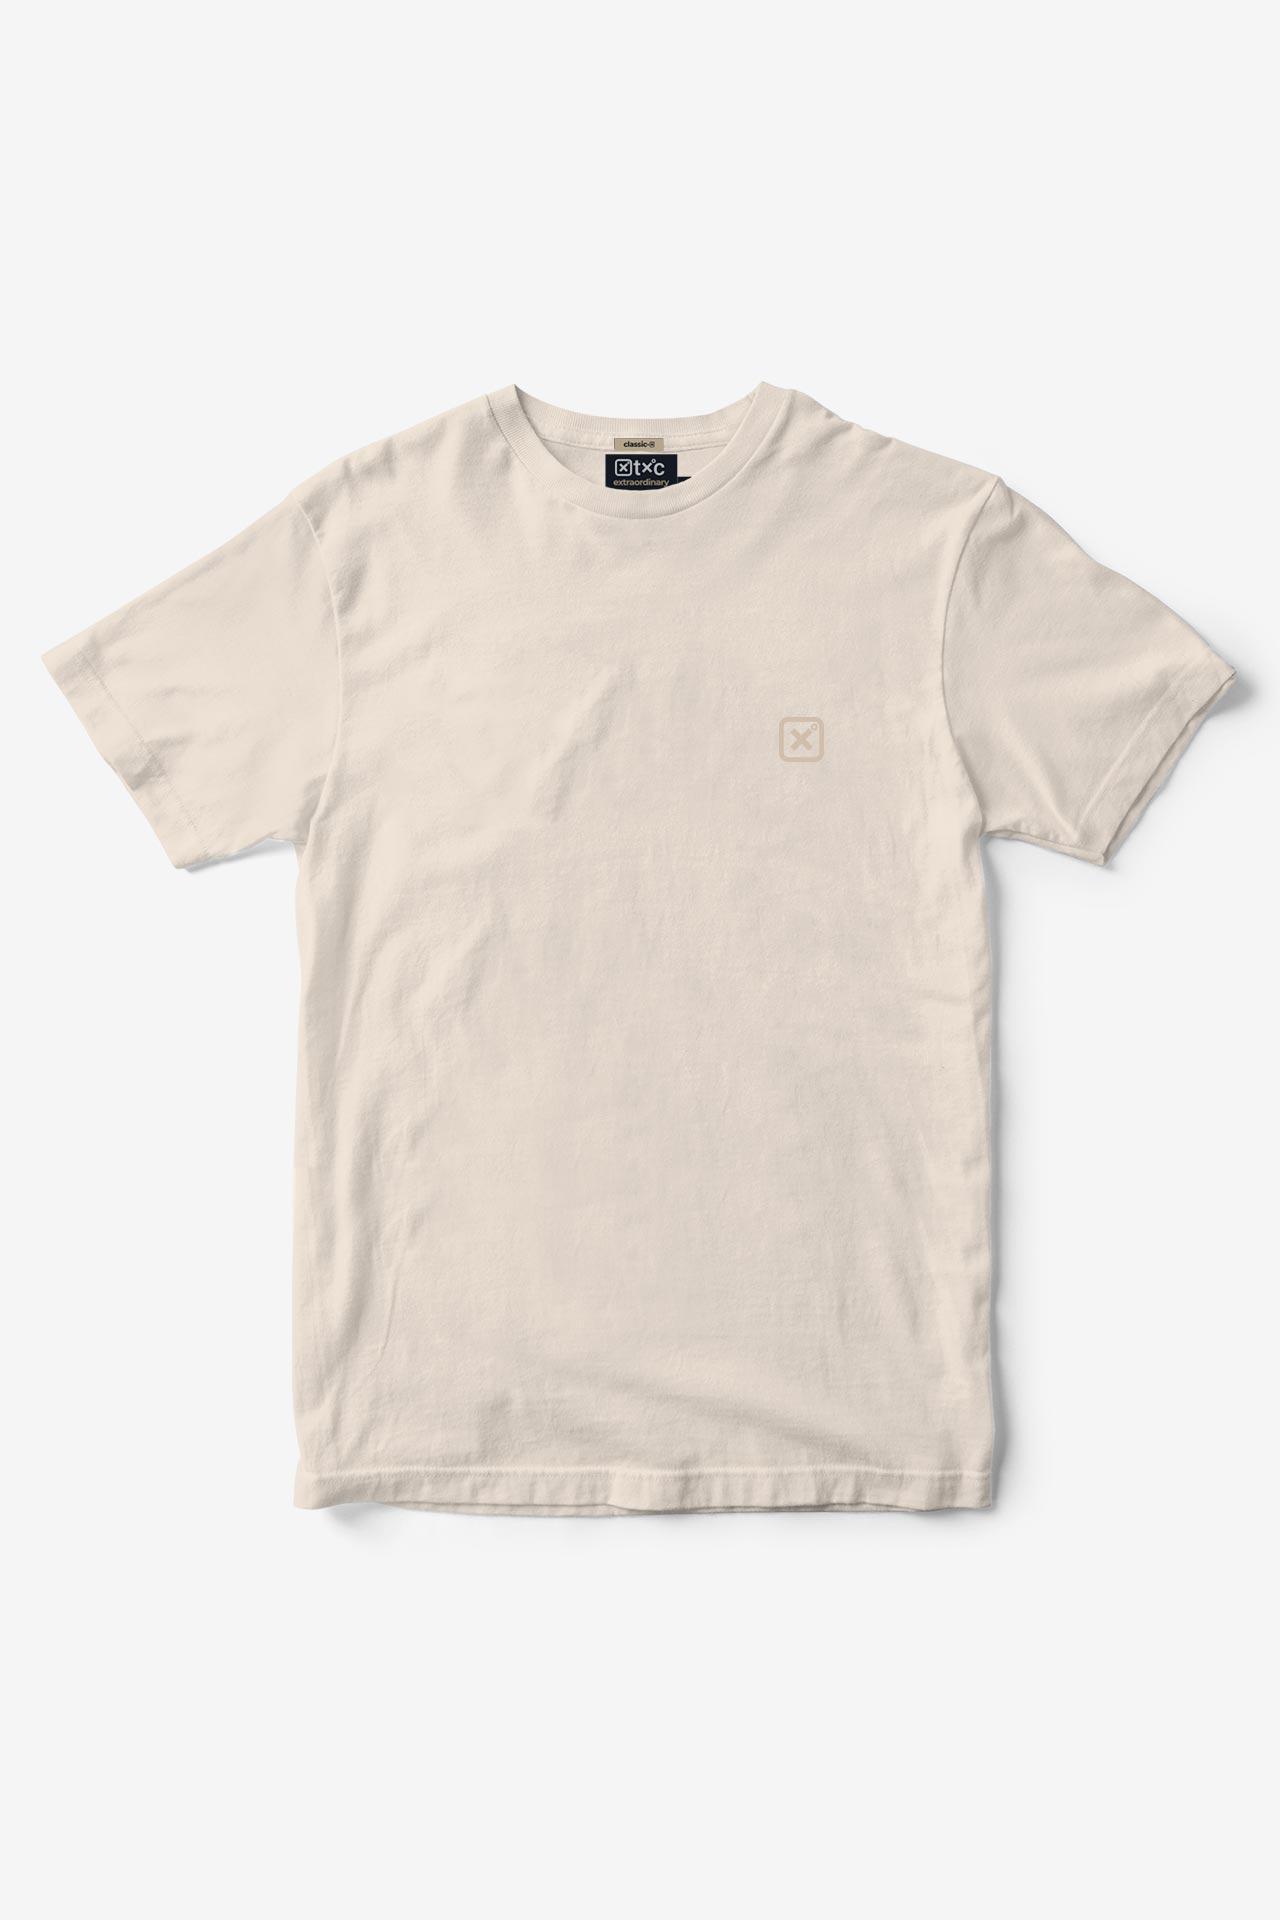 Camiseta Masculina TXC 19495